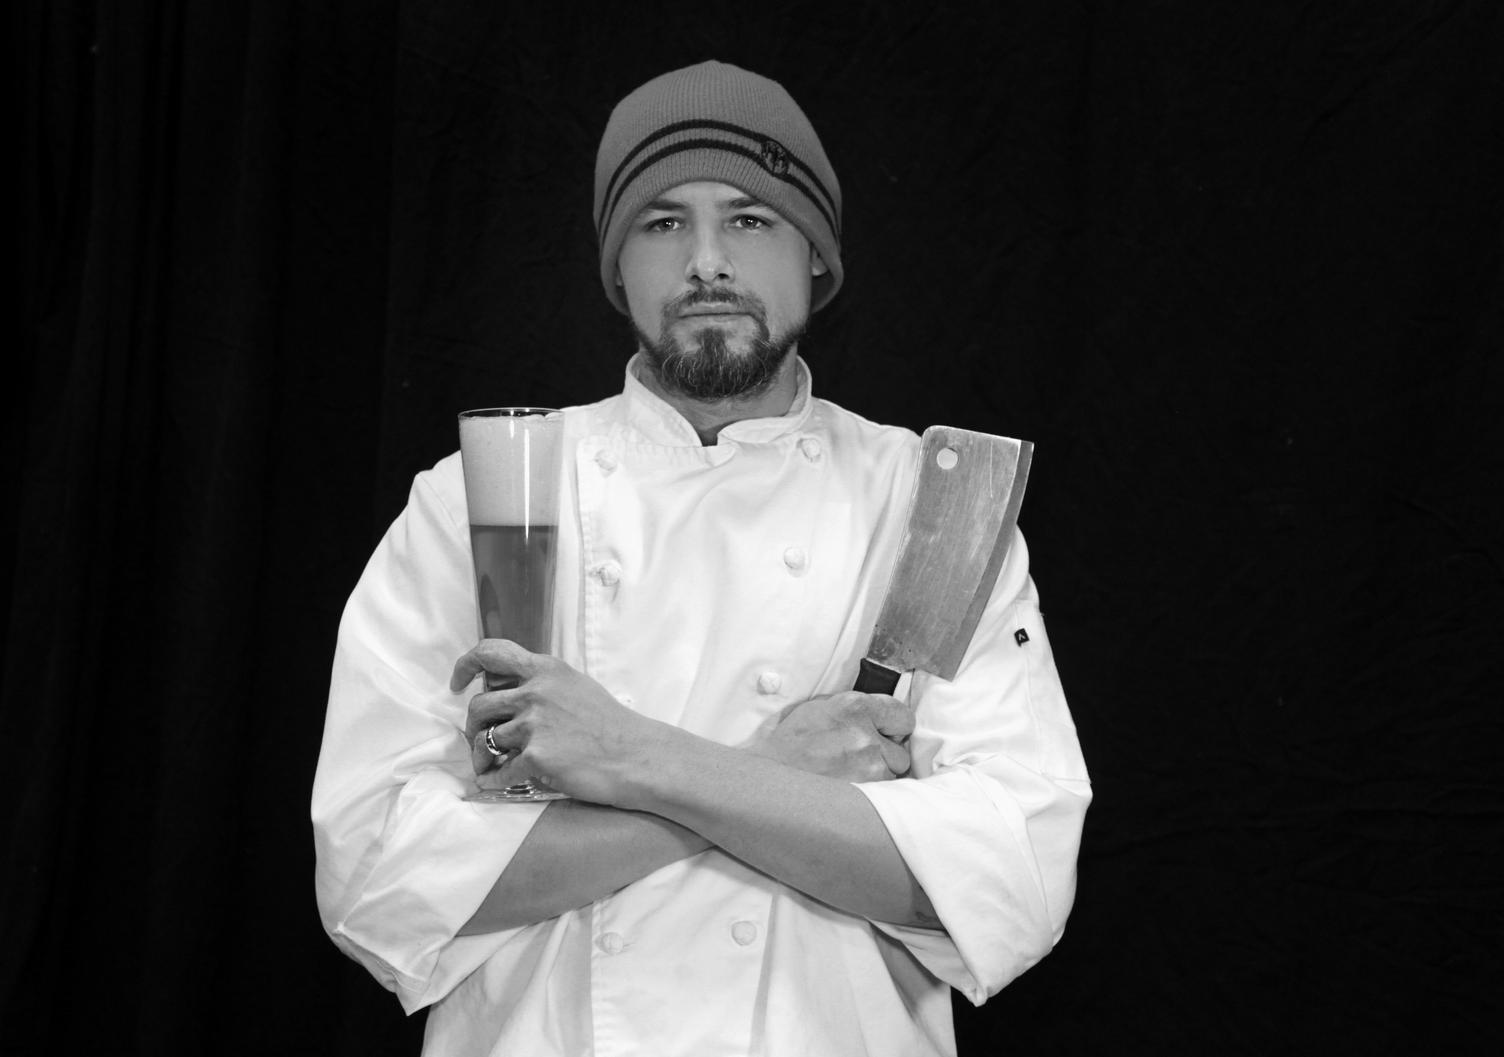 Chef Travis Waynick